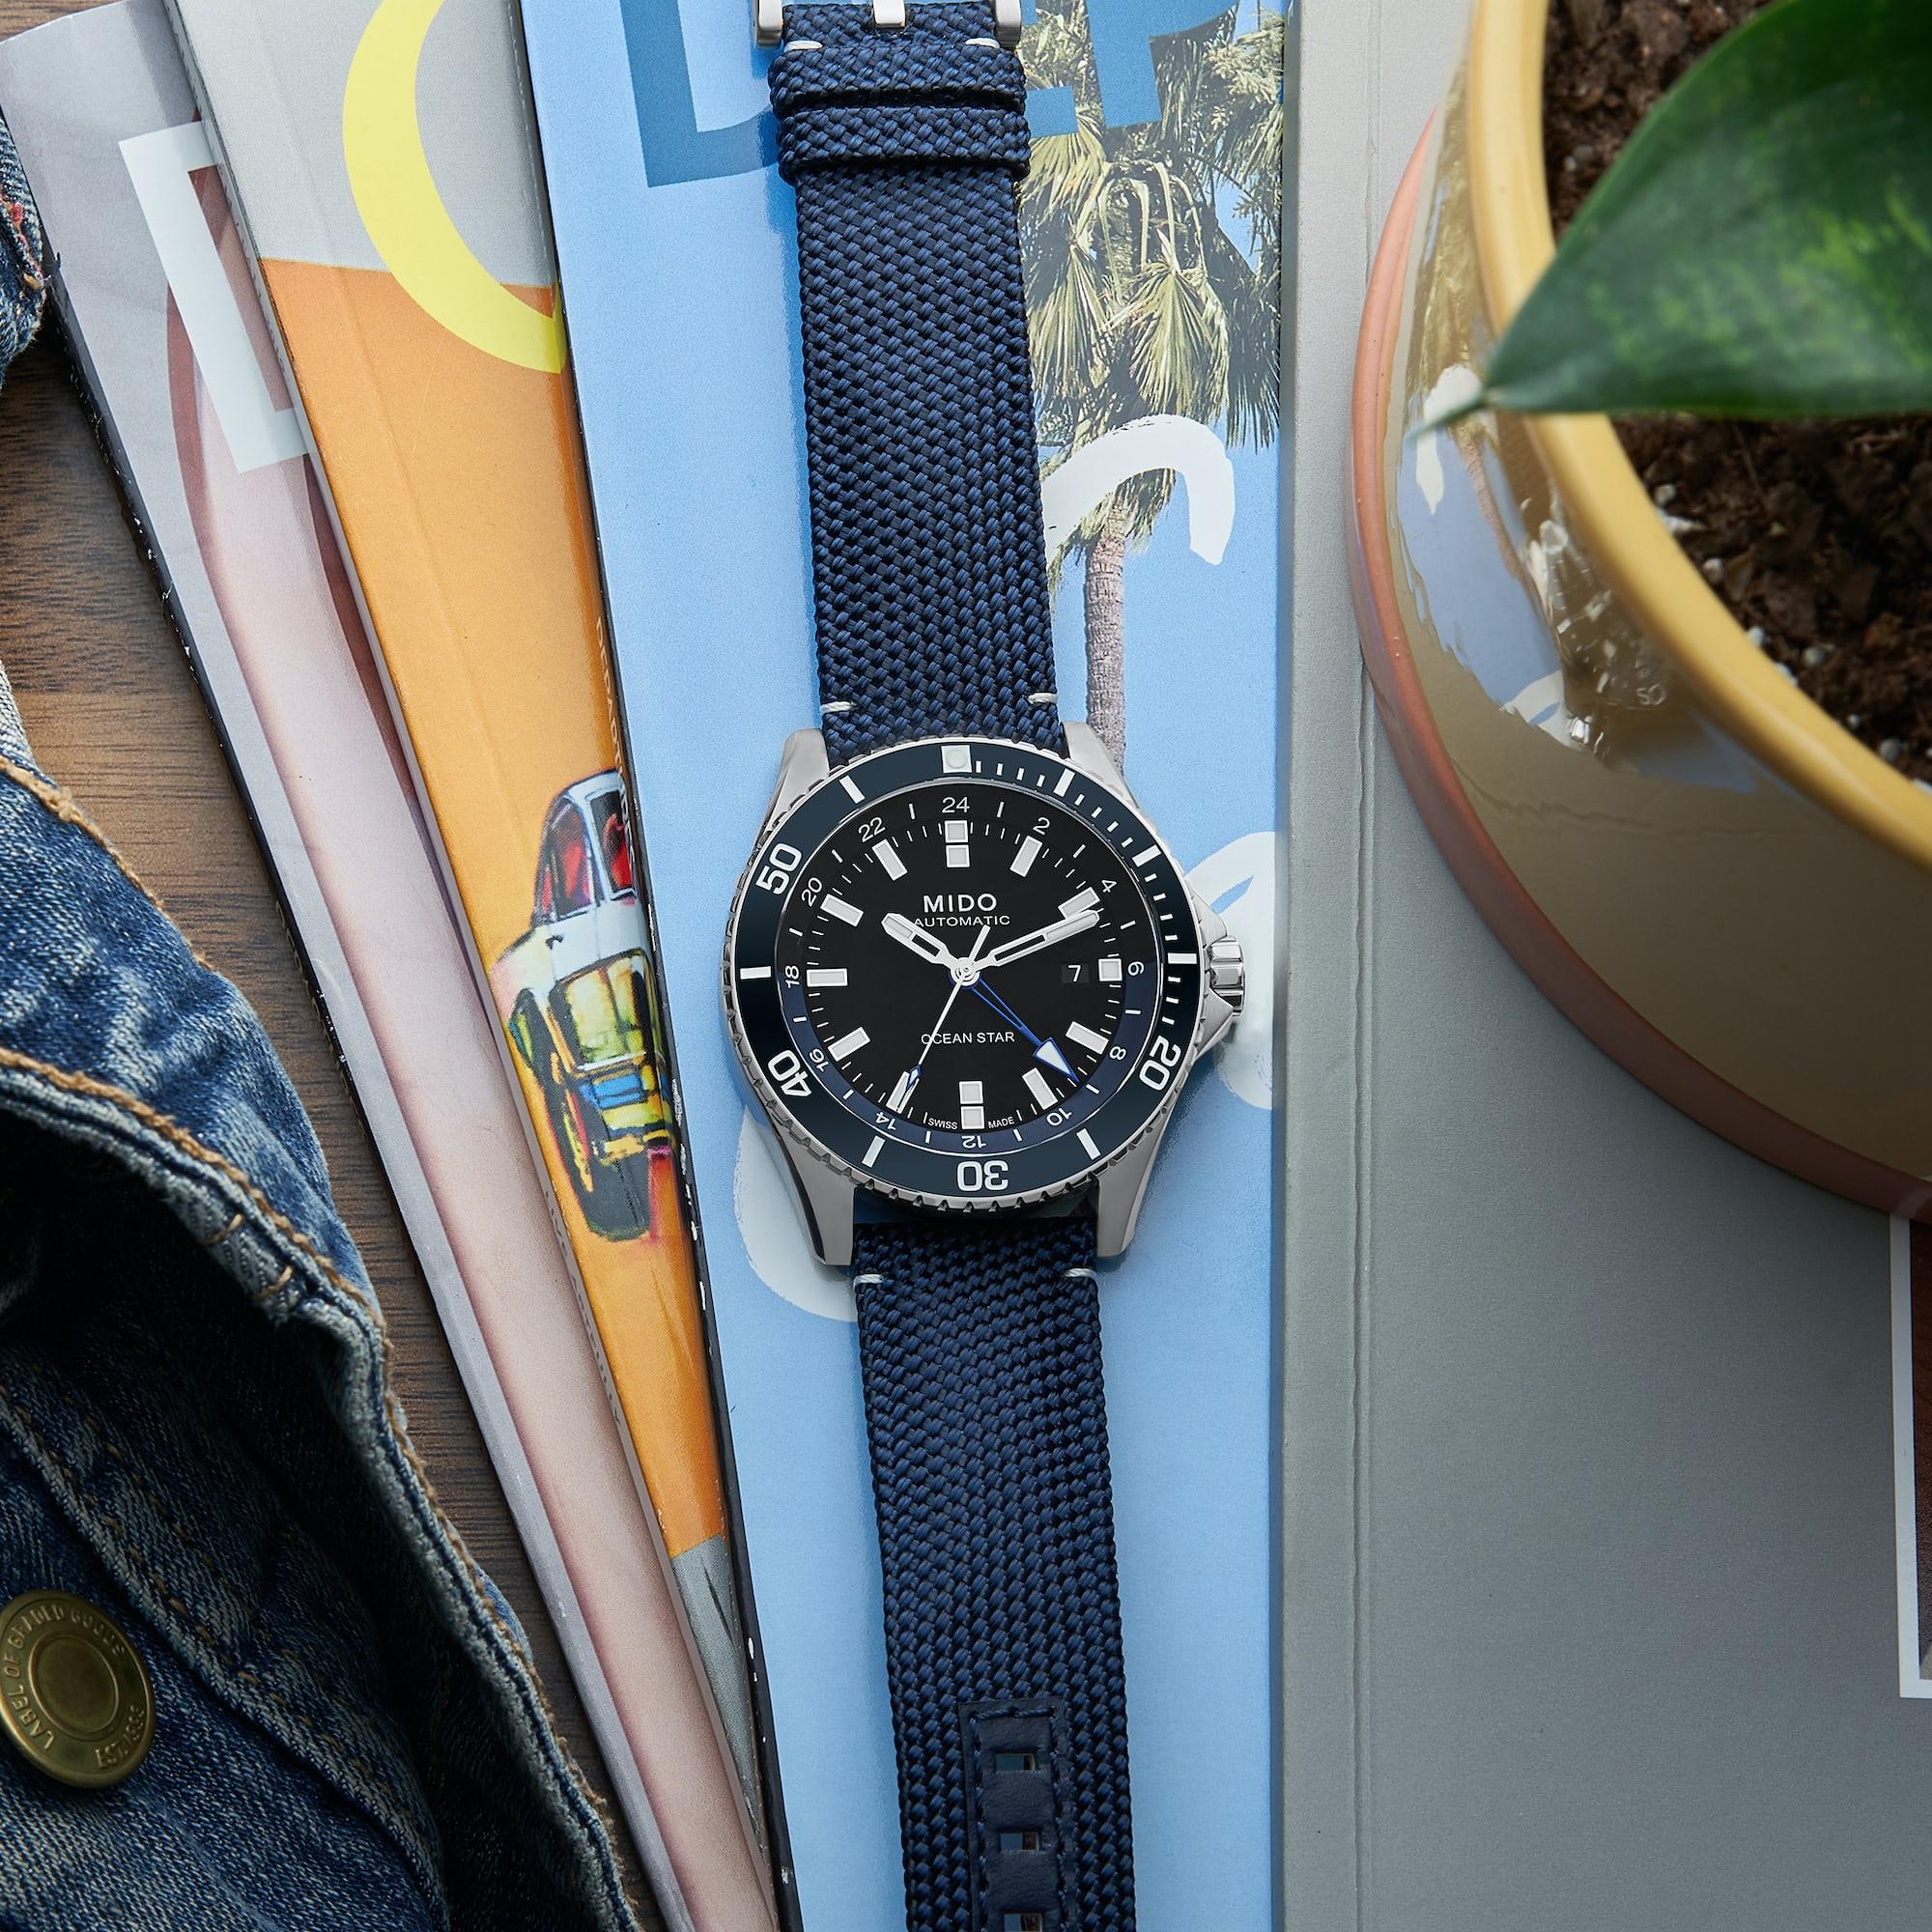 "<p><a href=""https://shop.hodinkee.com/products/mido-ocean-star-gmt-black-dial-blue-strap?_pos=2&amp;_sid=389582b2e&amp;_ss=r&amp;variant=32790424682571"" rel=""noopener"" target=""_blank""><u>Mido Ocean Star GMT</u></a></p>"